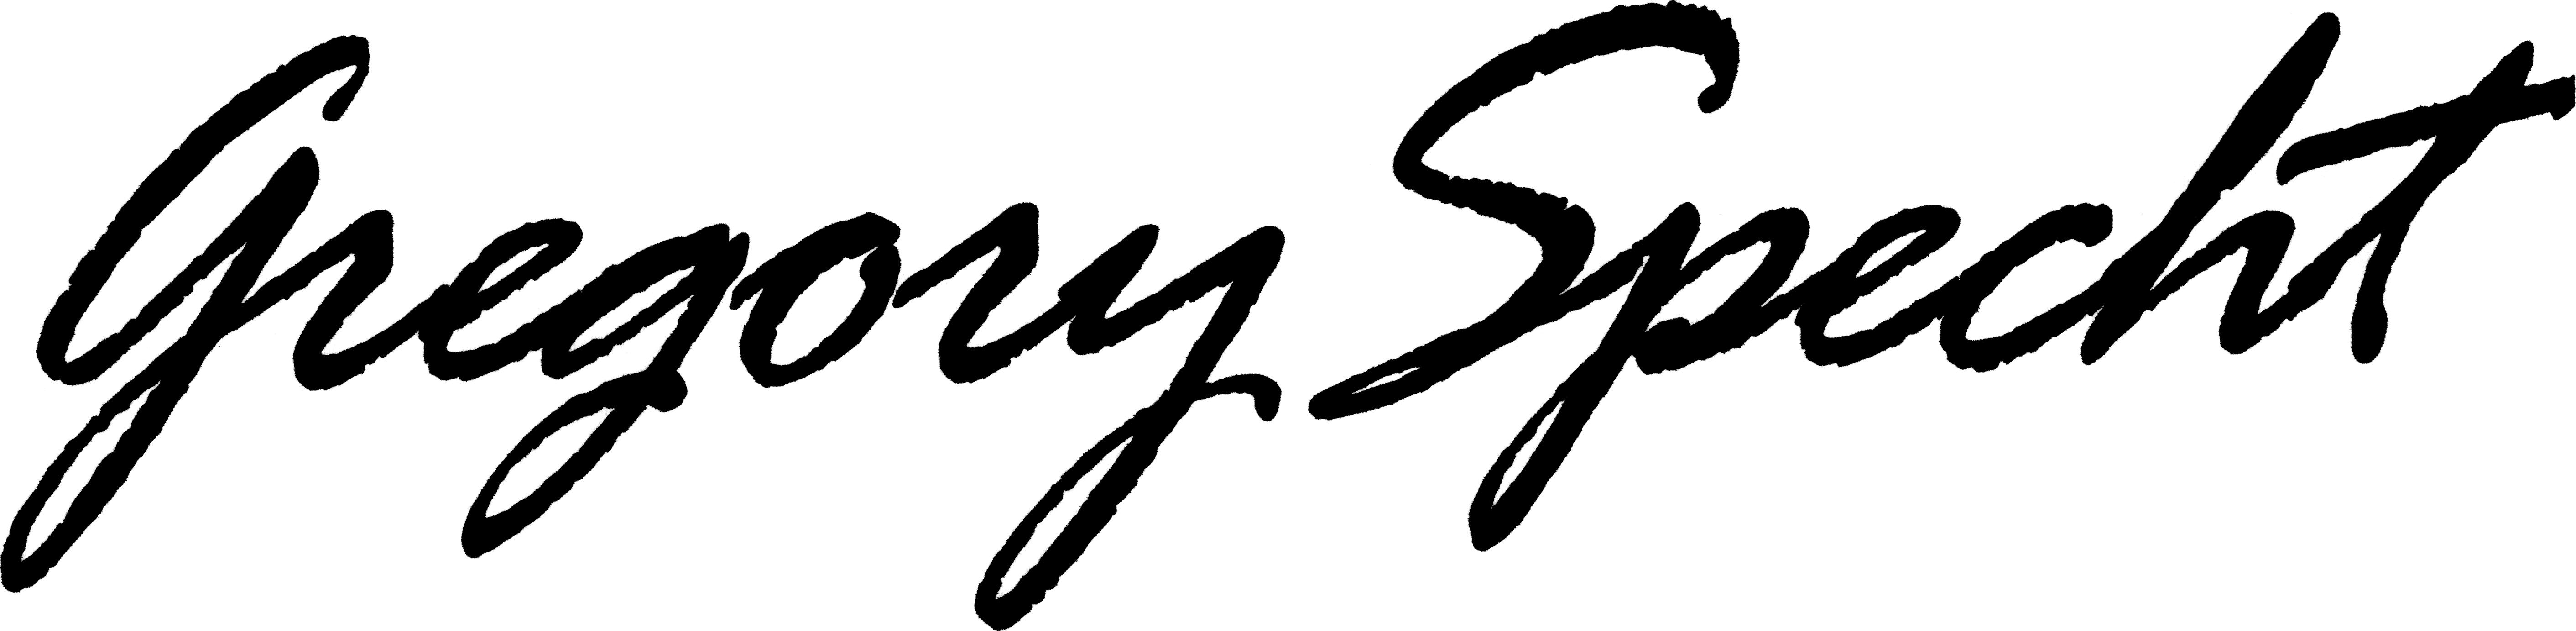 Gregory Specht Signature